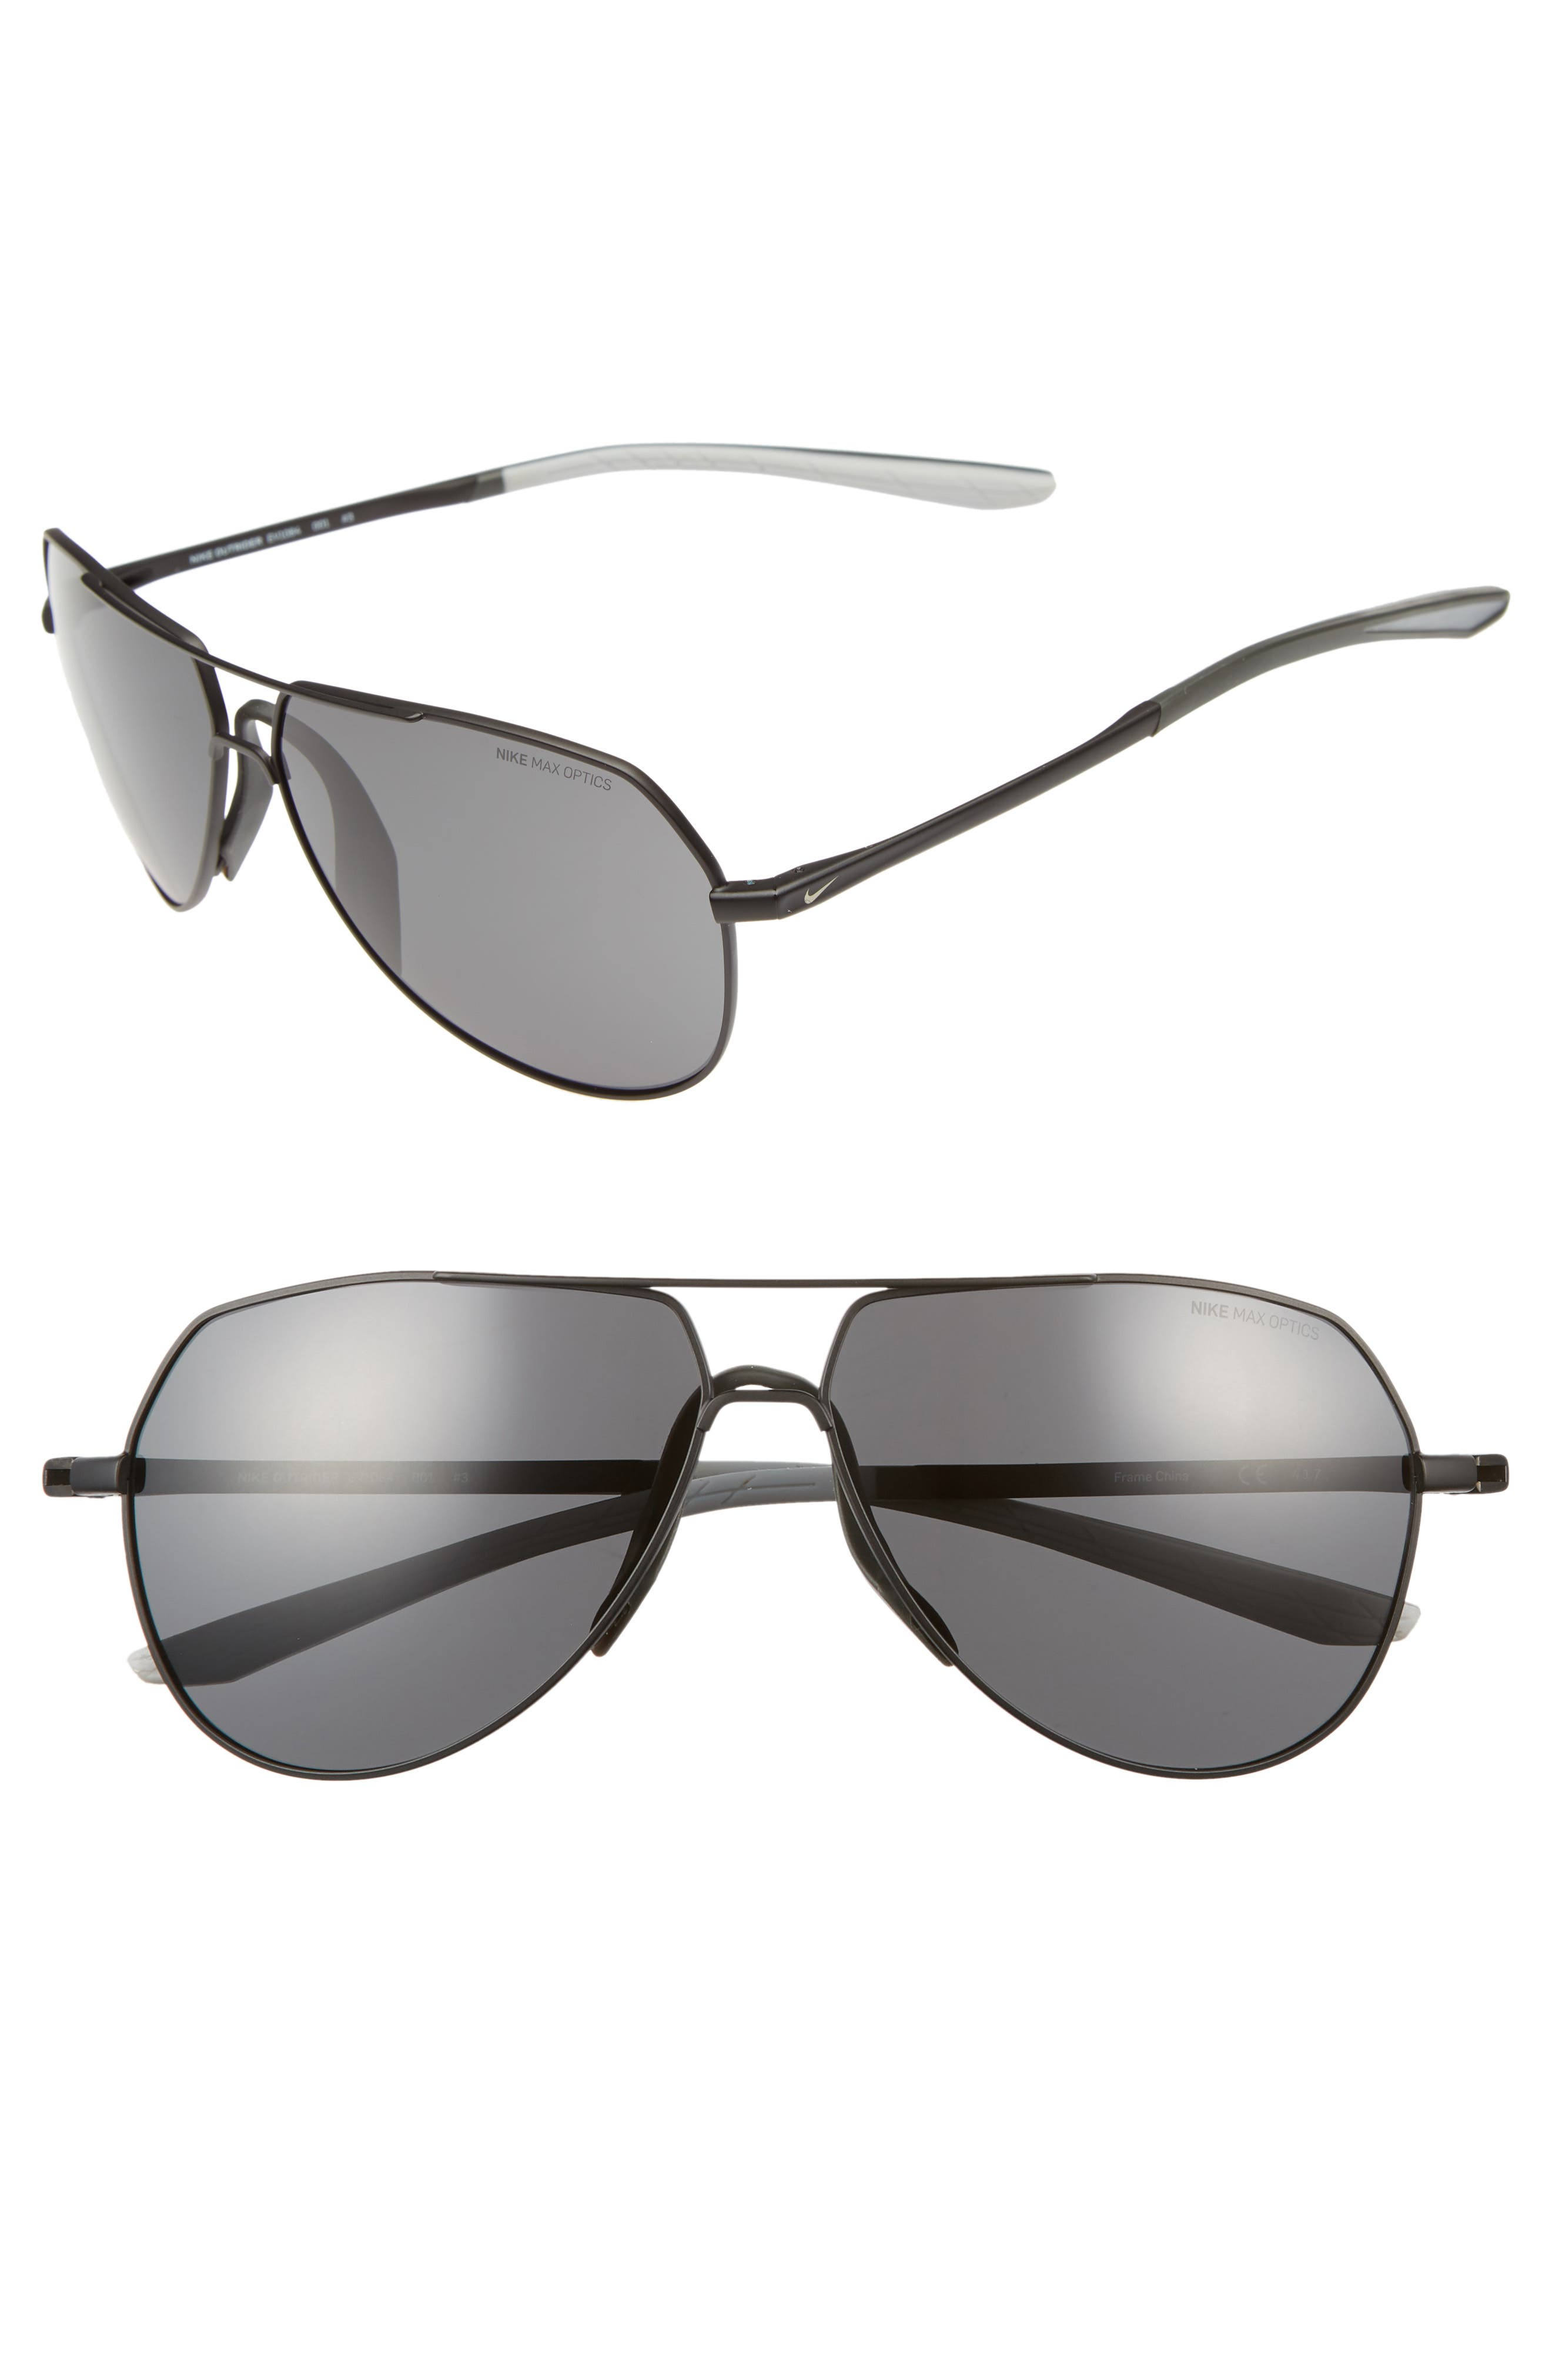 Nike Outrider 62Mm Oversize Aviator Sunglasses - Black/ Grey